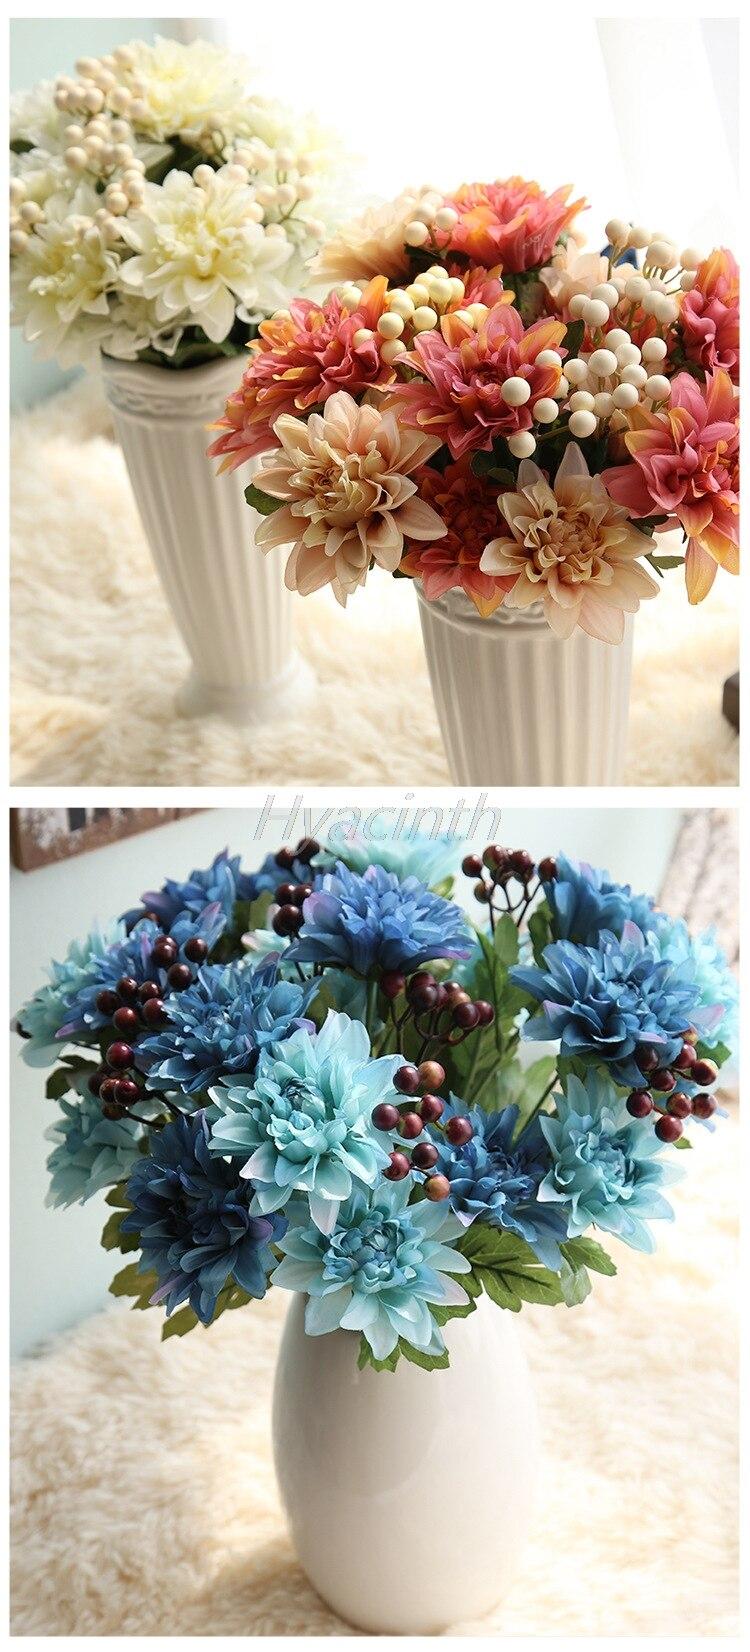 Vivid Dahlia Beam Simulation Took Silk Flower Wedding Supplies